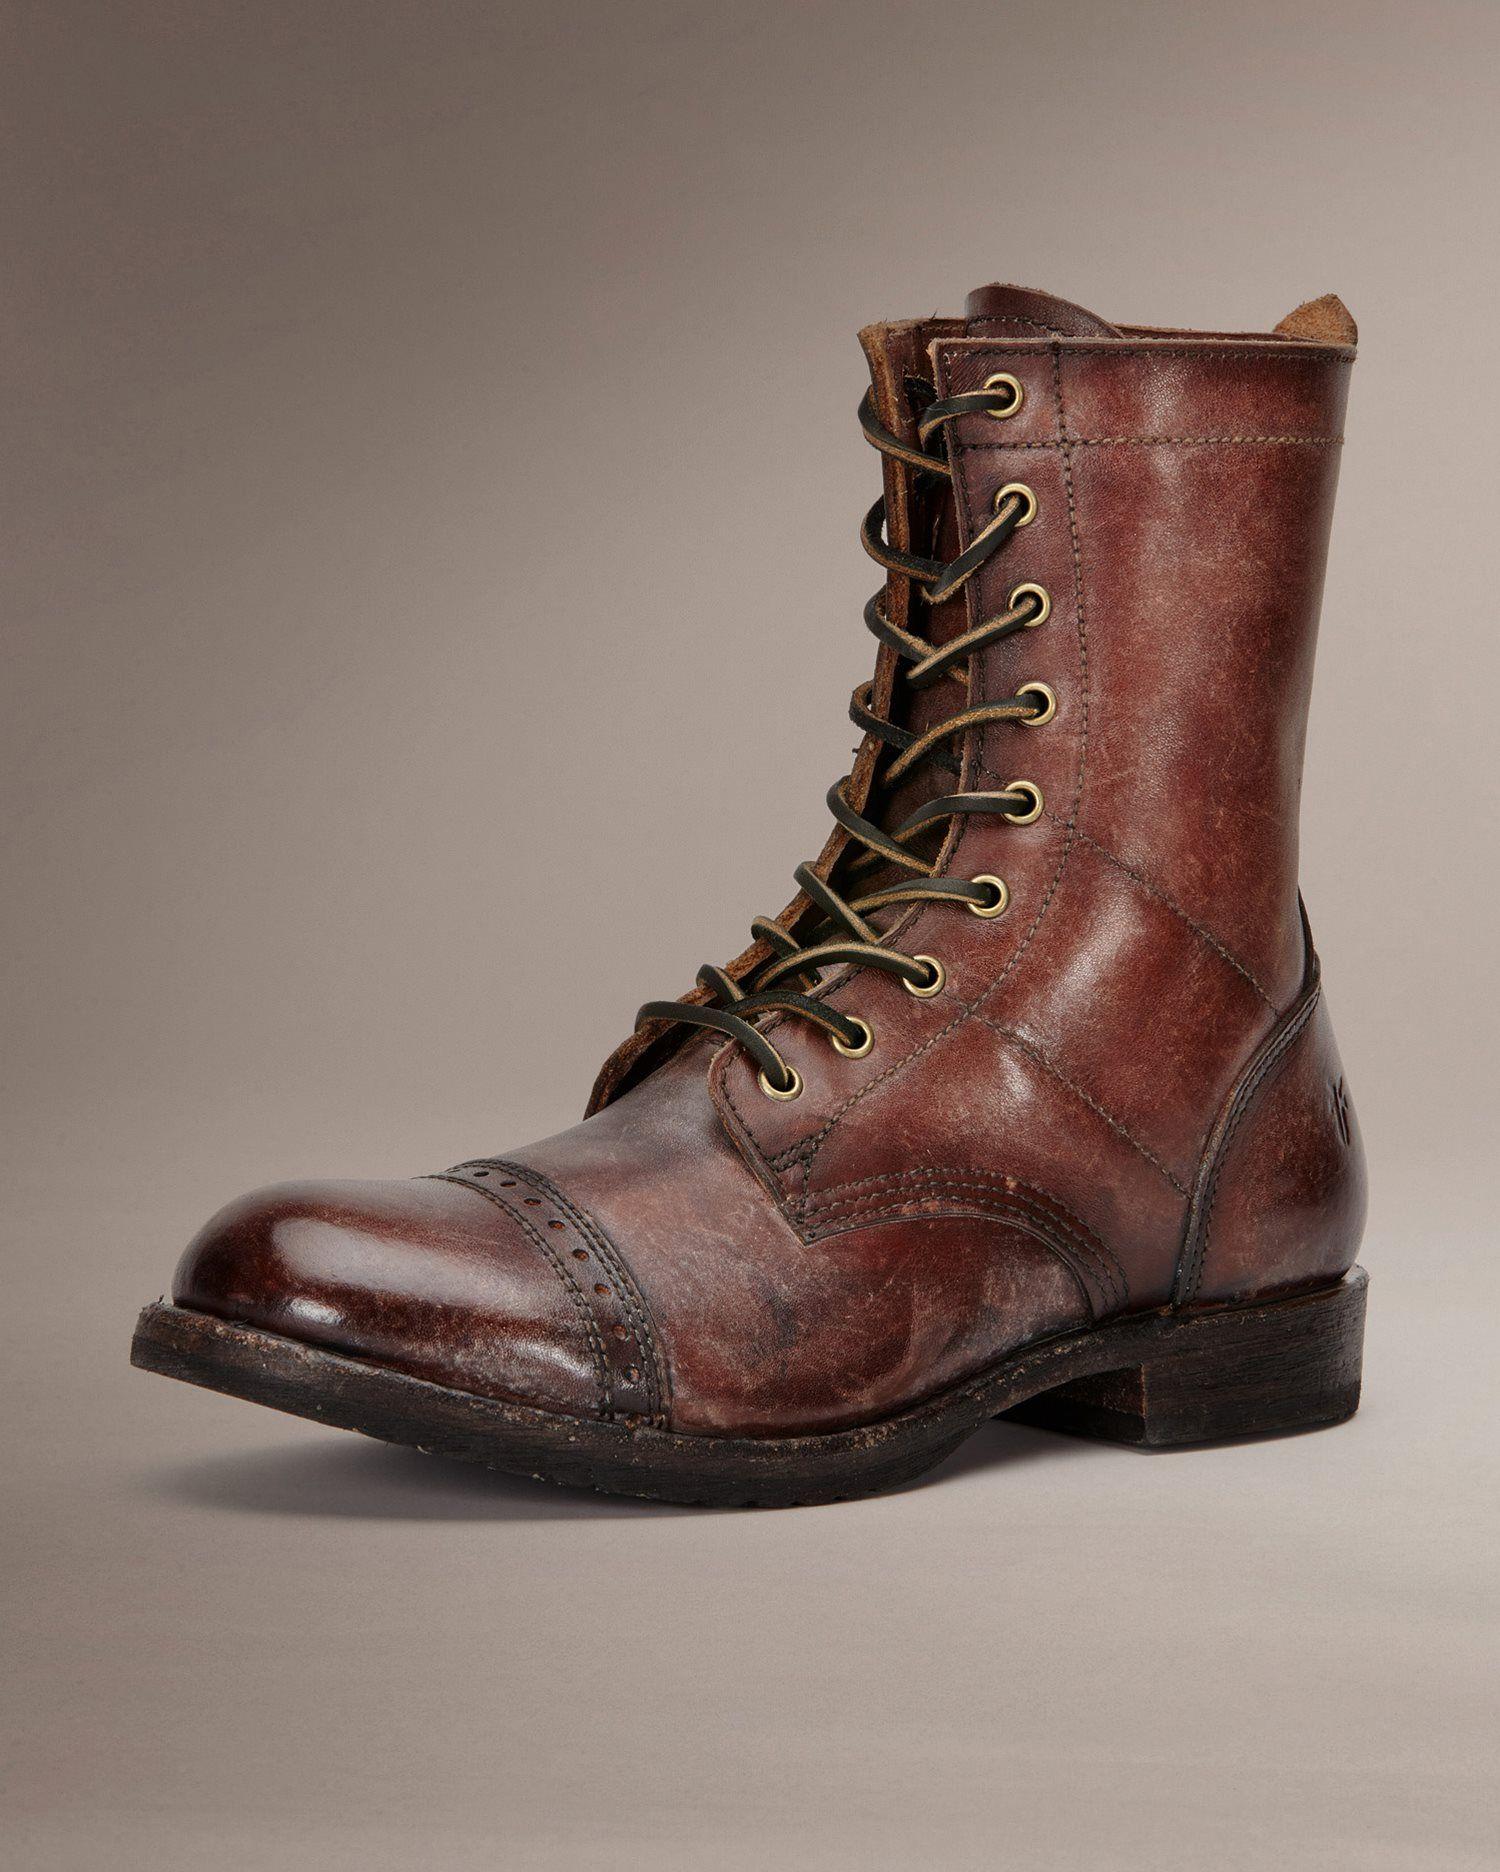 The Frye Company Sz 7 D Beige Suede Moc Toe Ankle High Boots Men